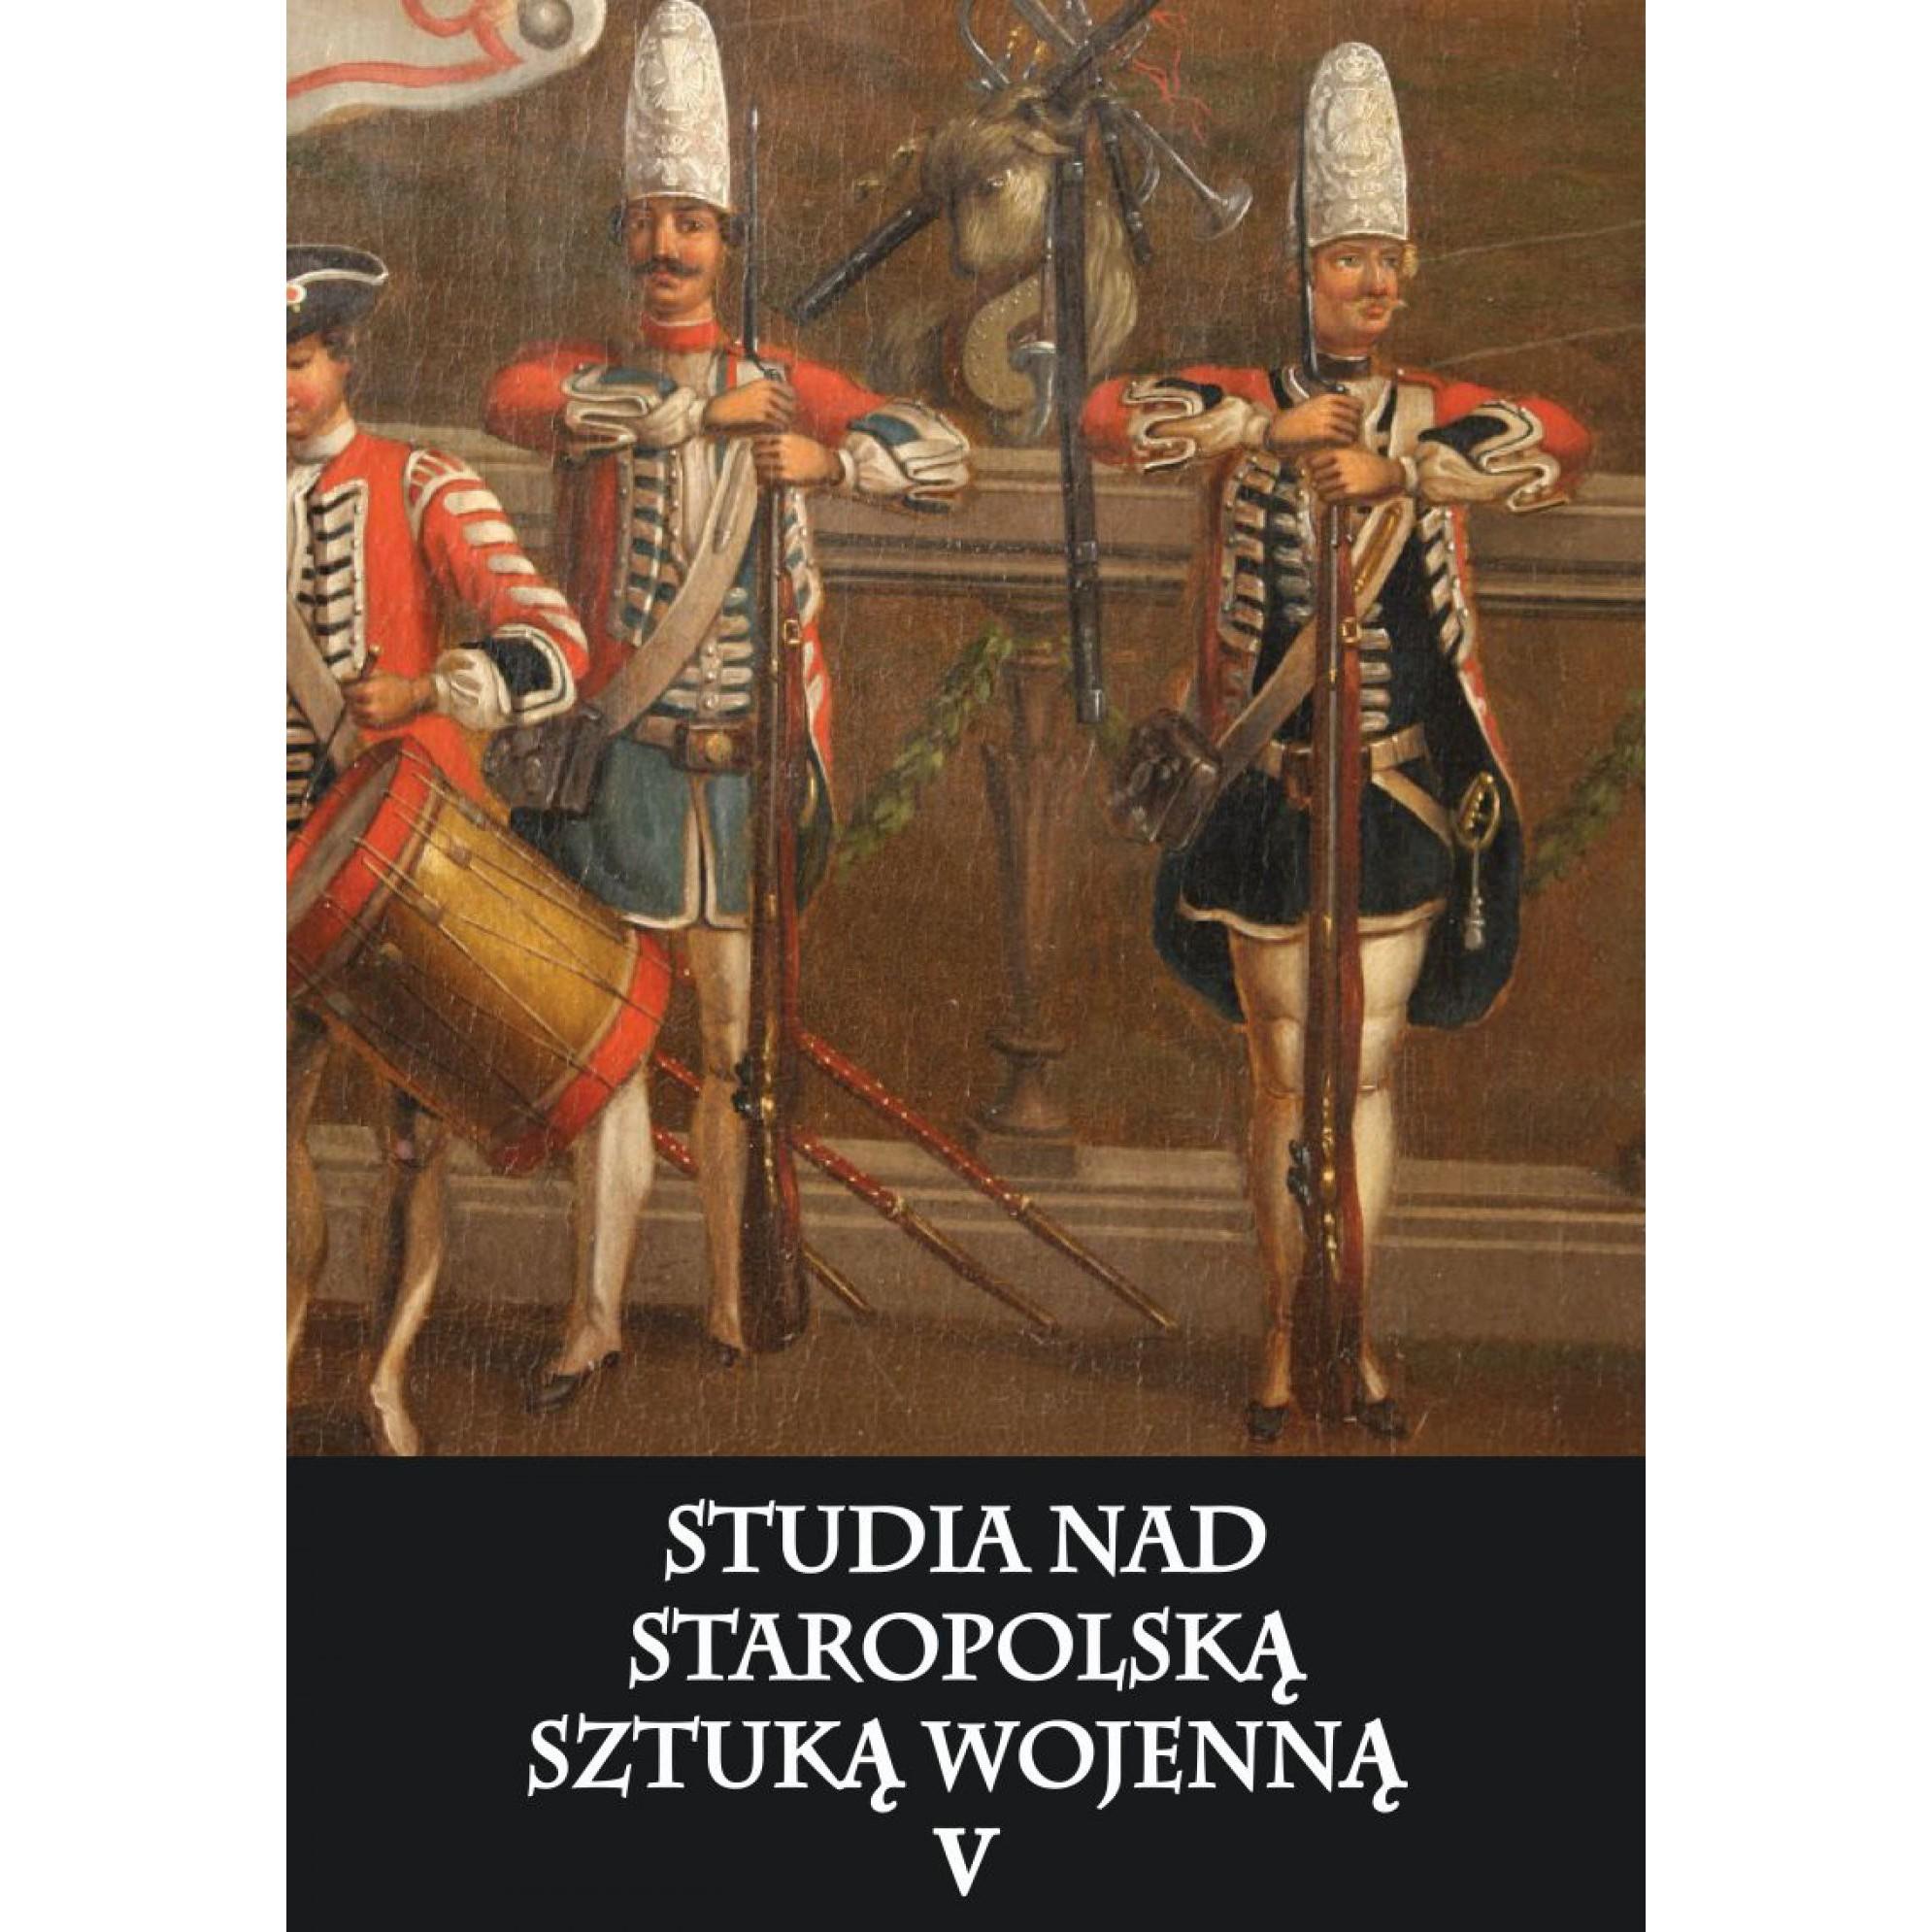 Studia nad staropolską sztuką wojenną tom V - Outlet